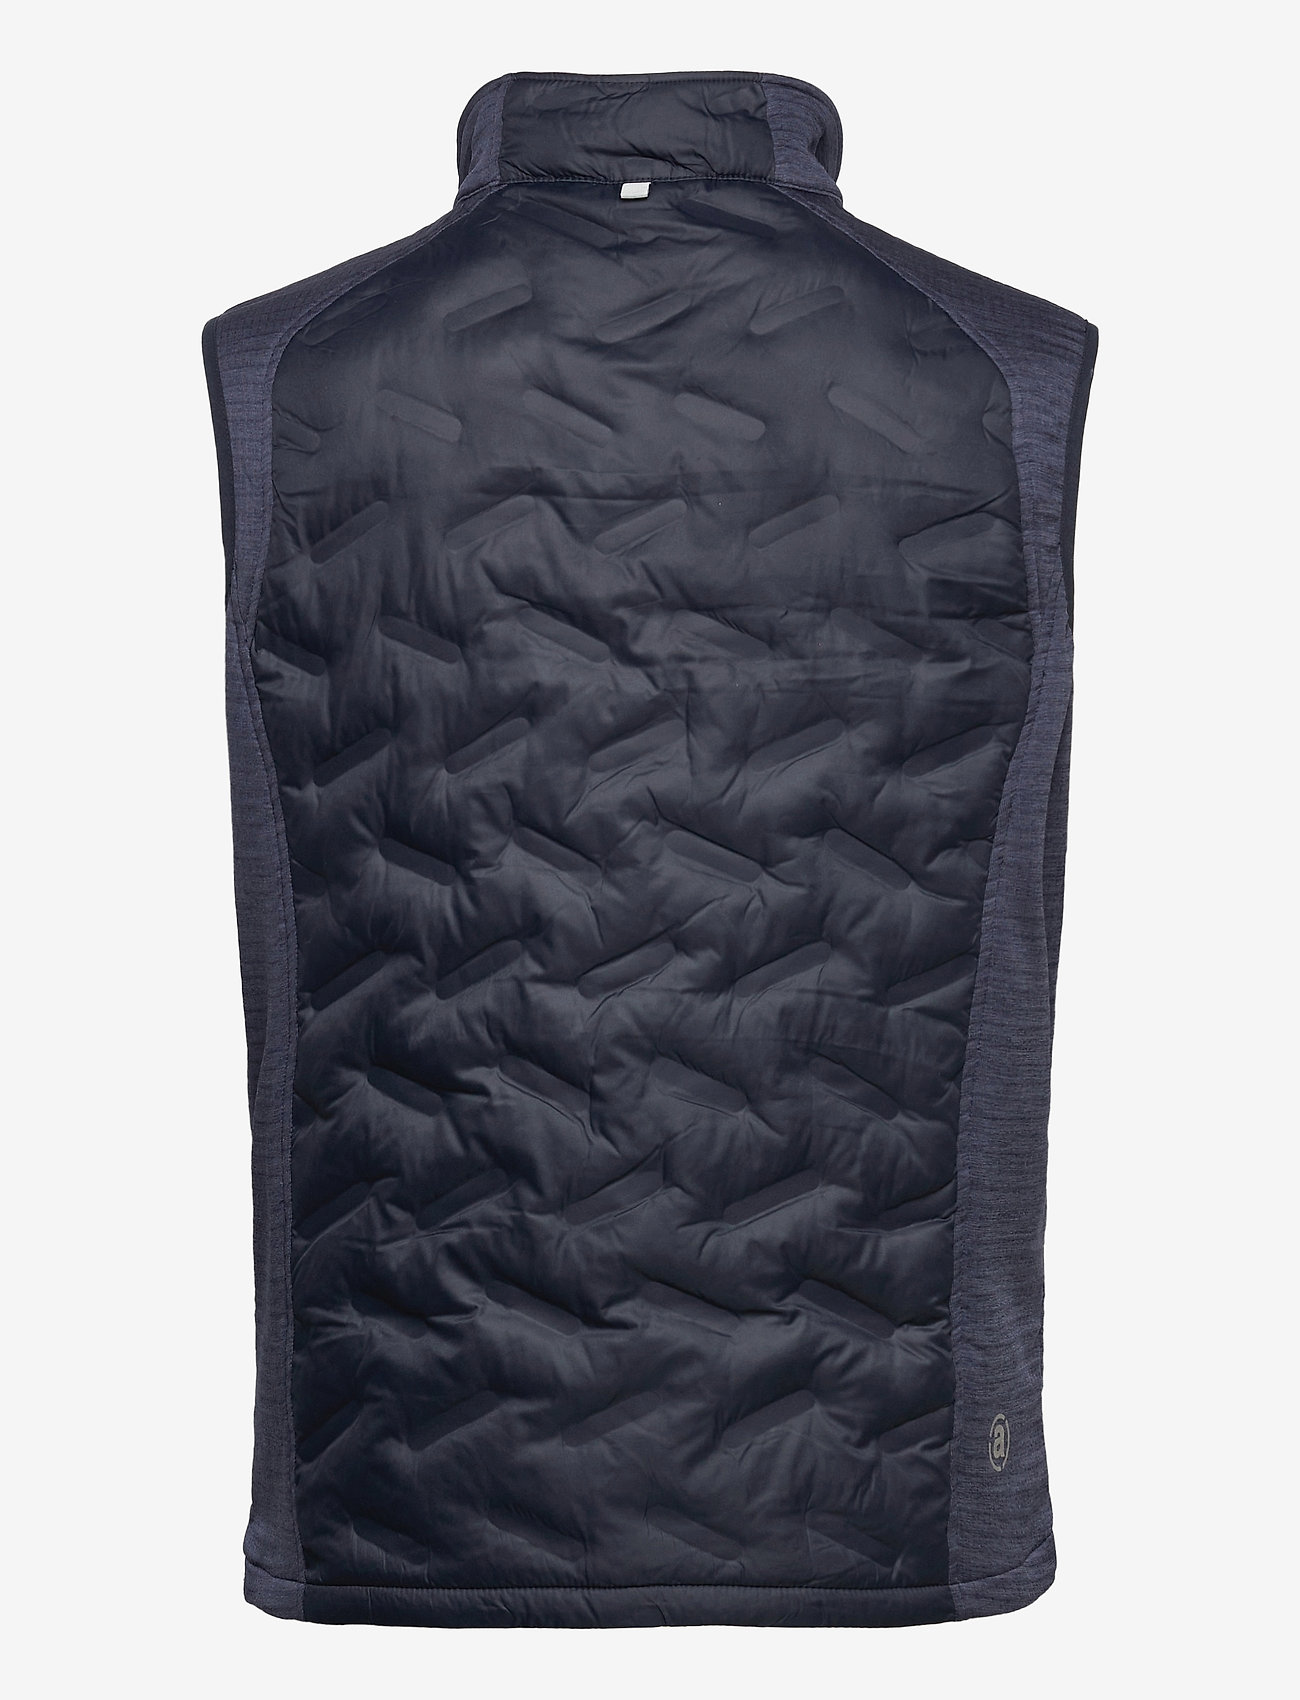 Abacus - Mens Dunes hybrid vest - golf jackets - navy - 1